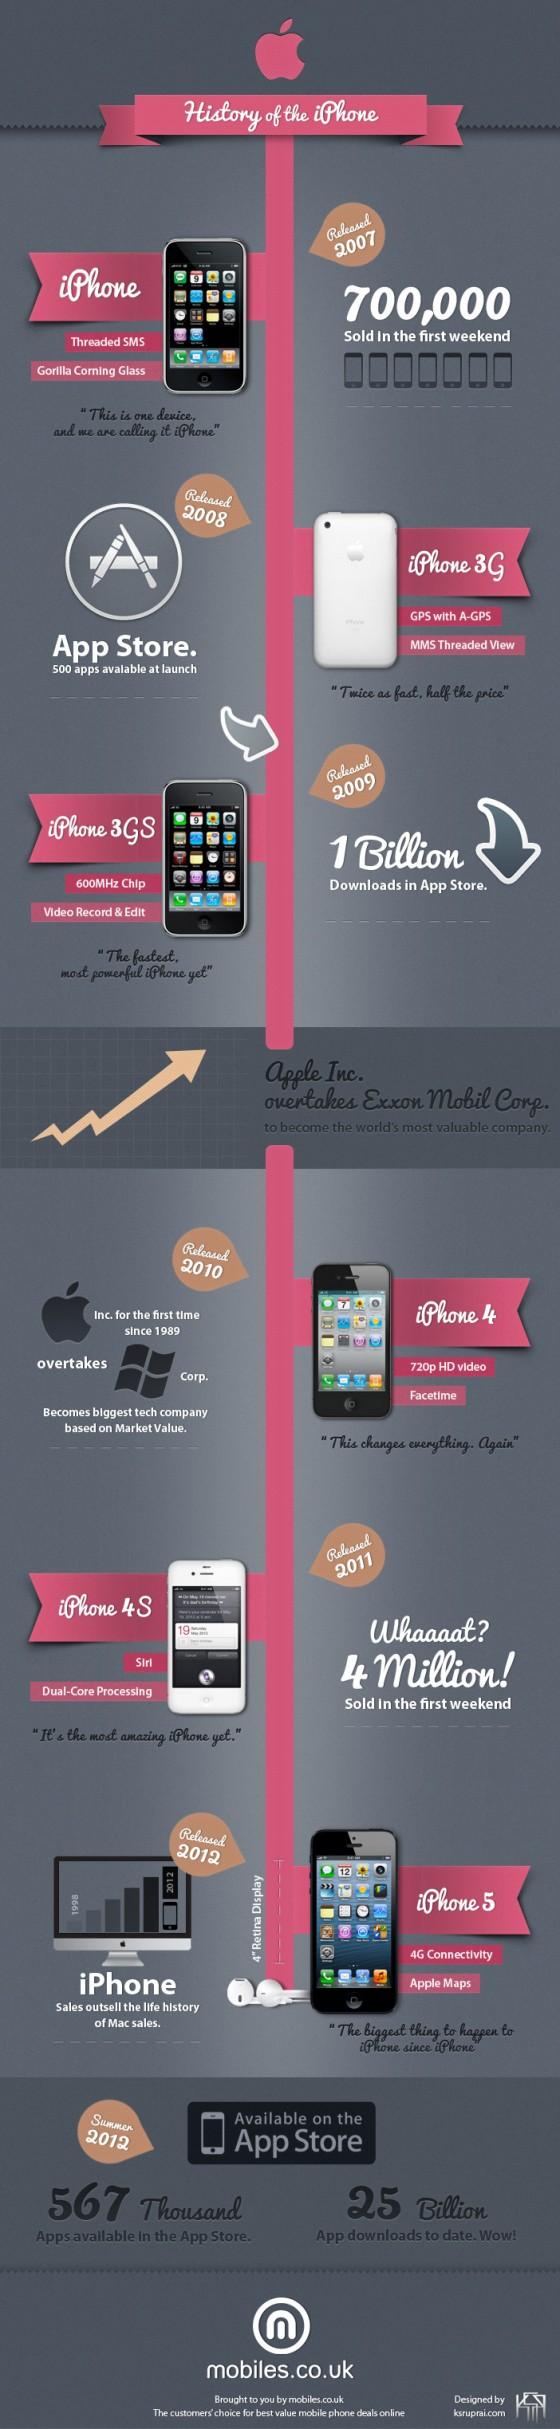 Infográfico: História do iPhone